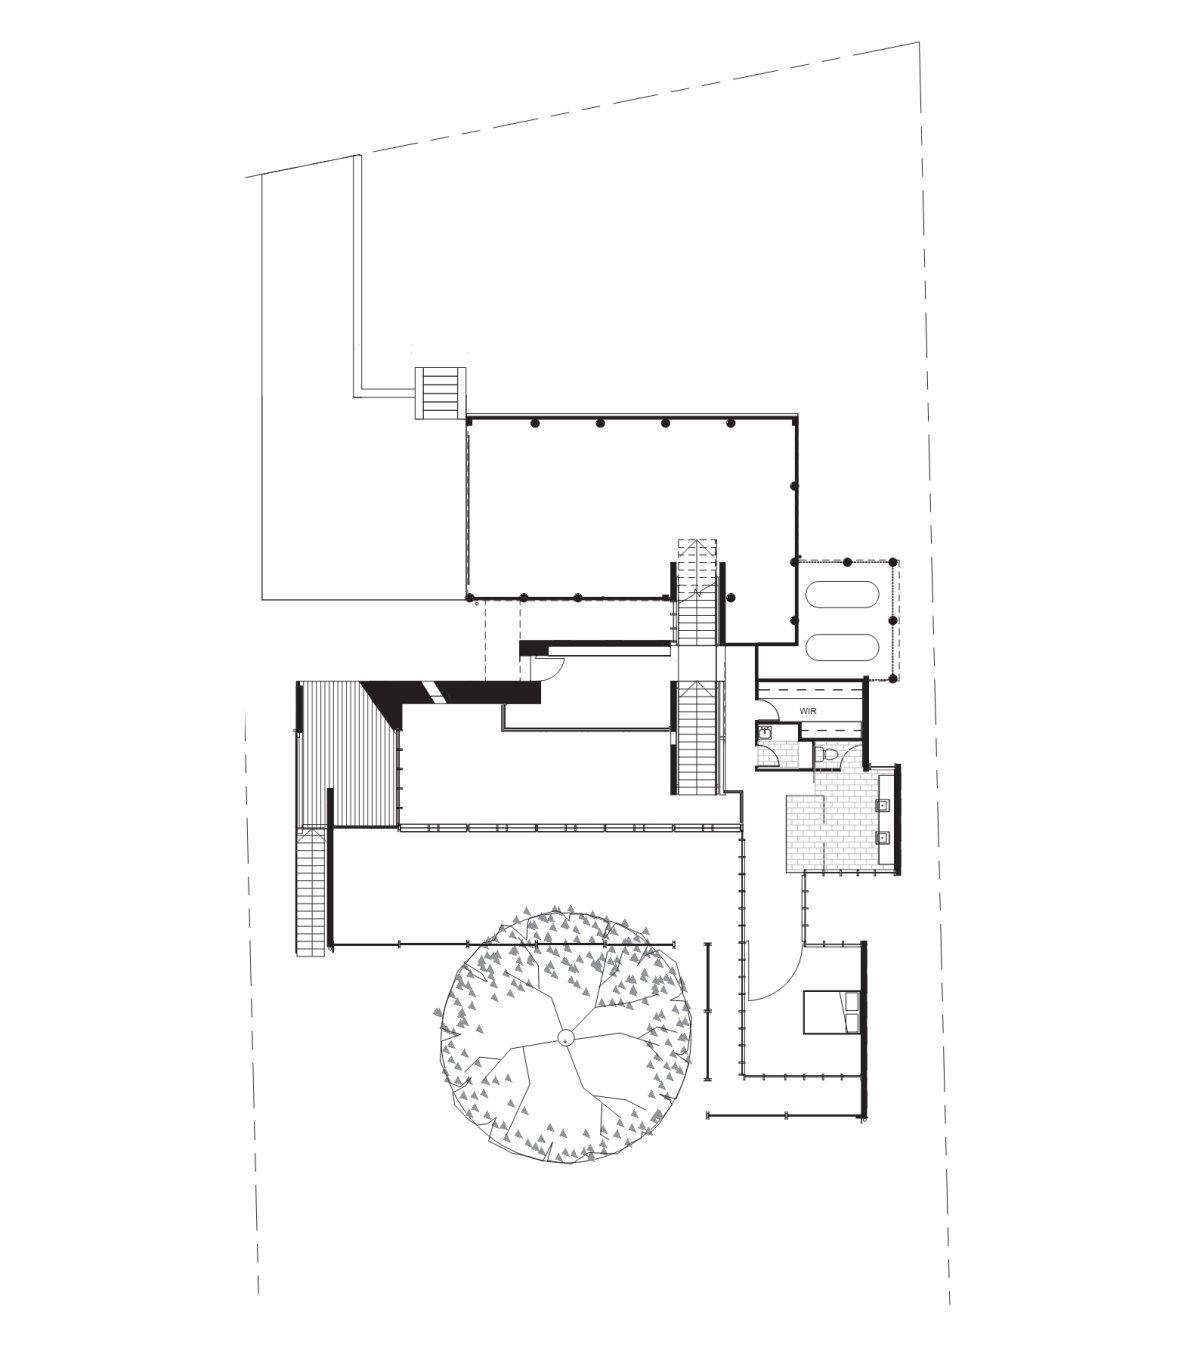 First Floor Plan, Taringa House in Brisbane, Australia